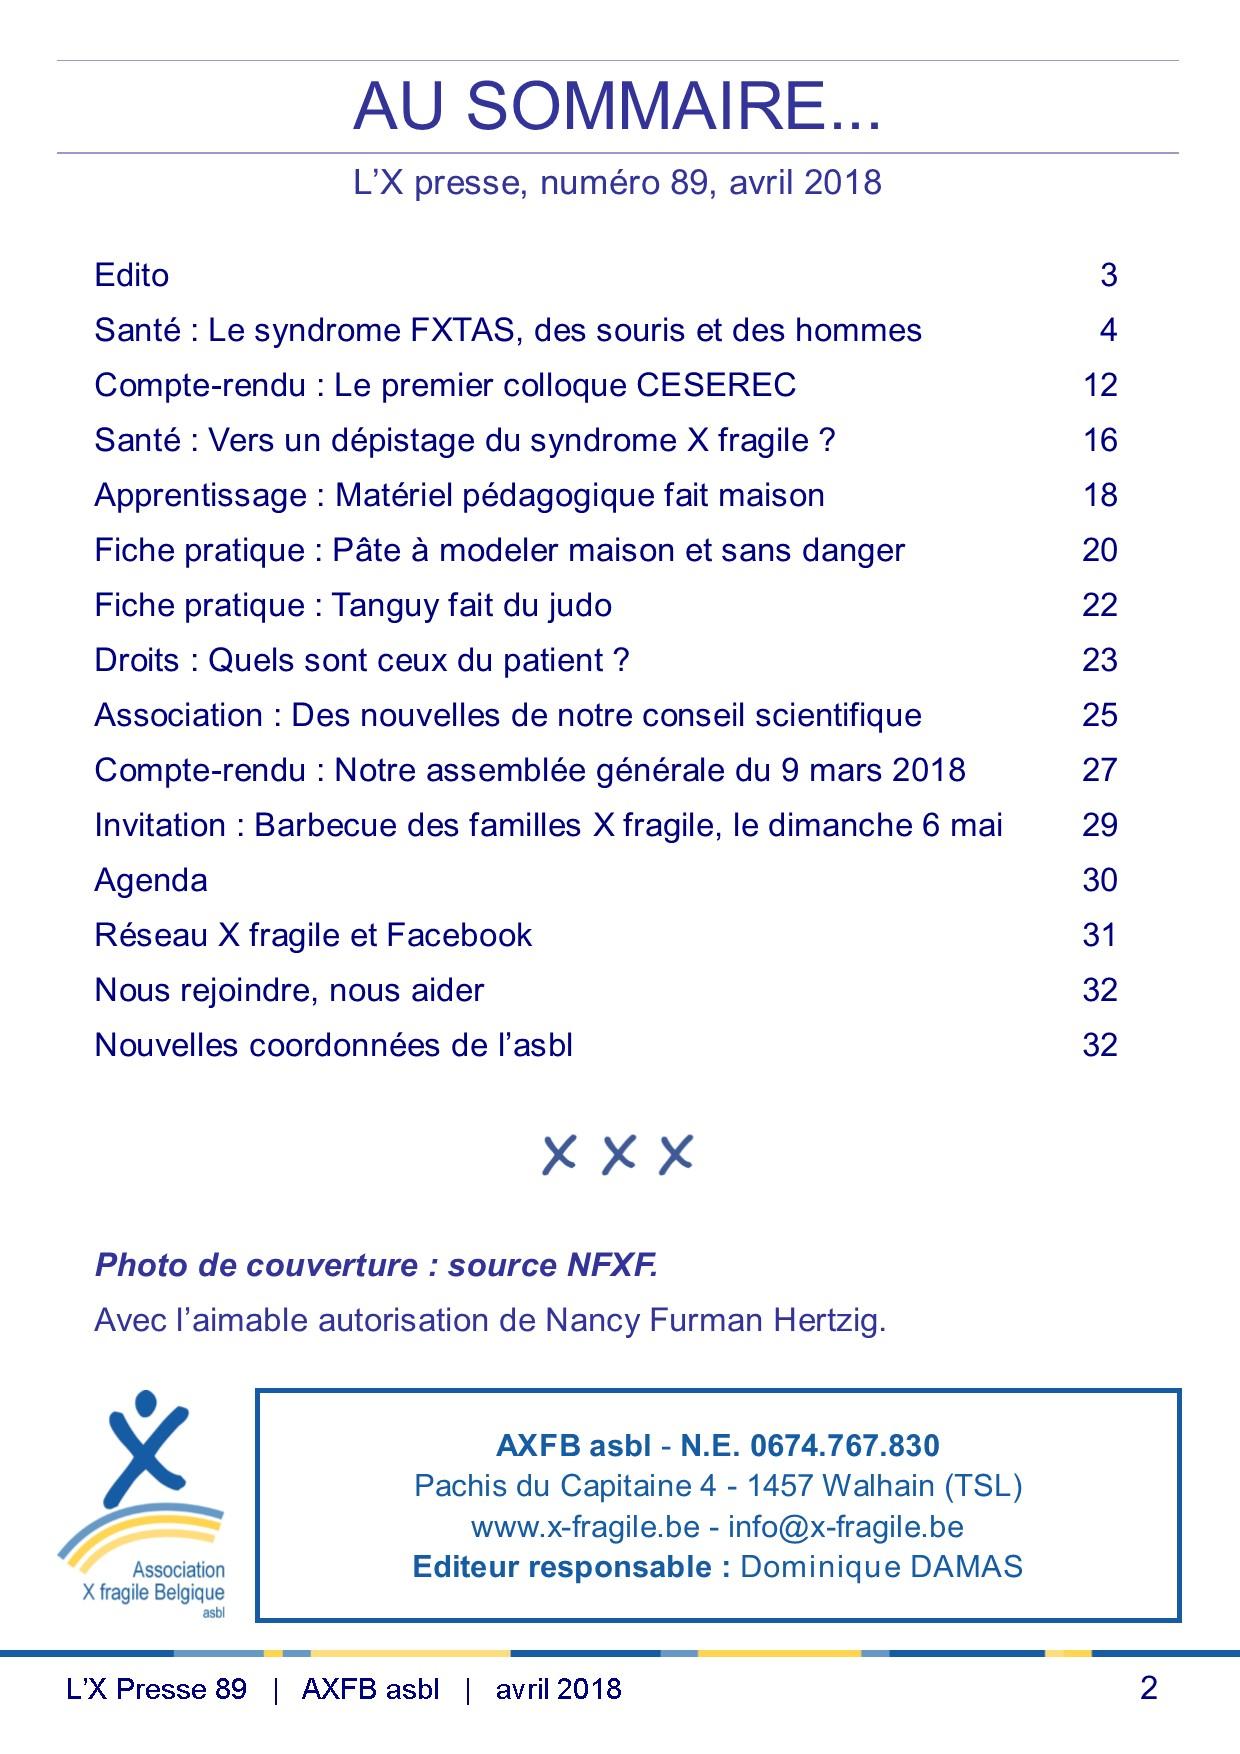 X Presse 89 - Sommaire